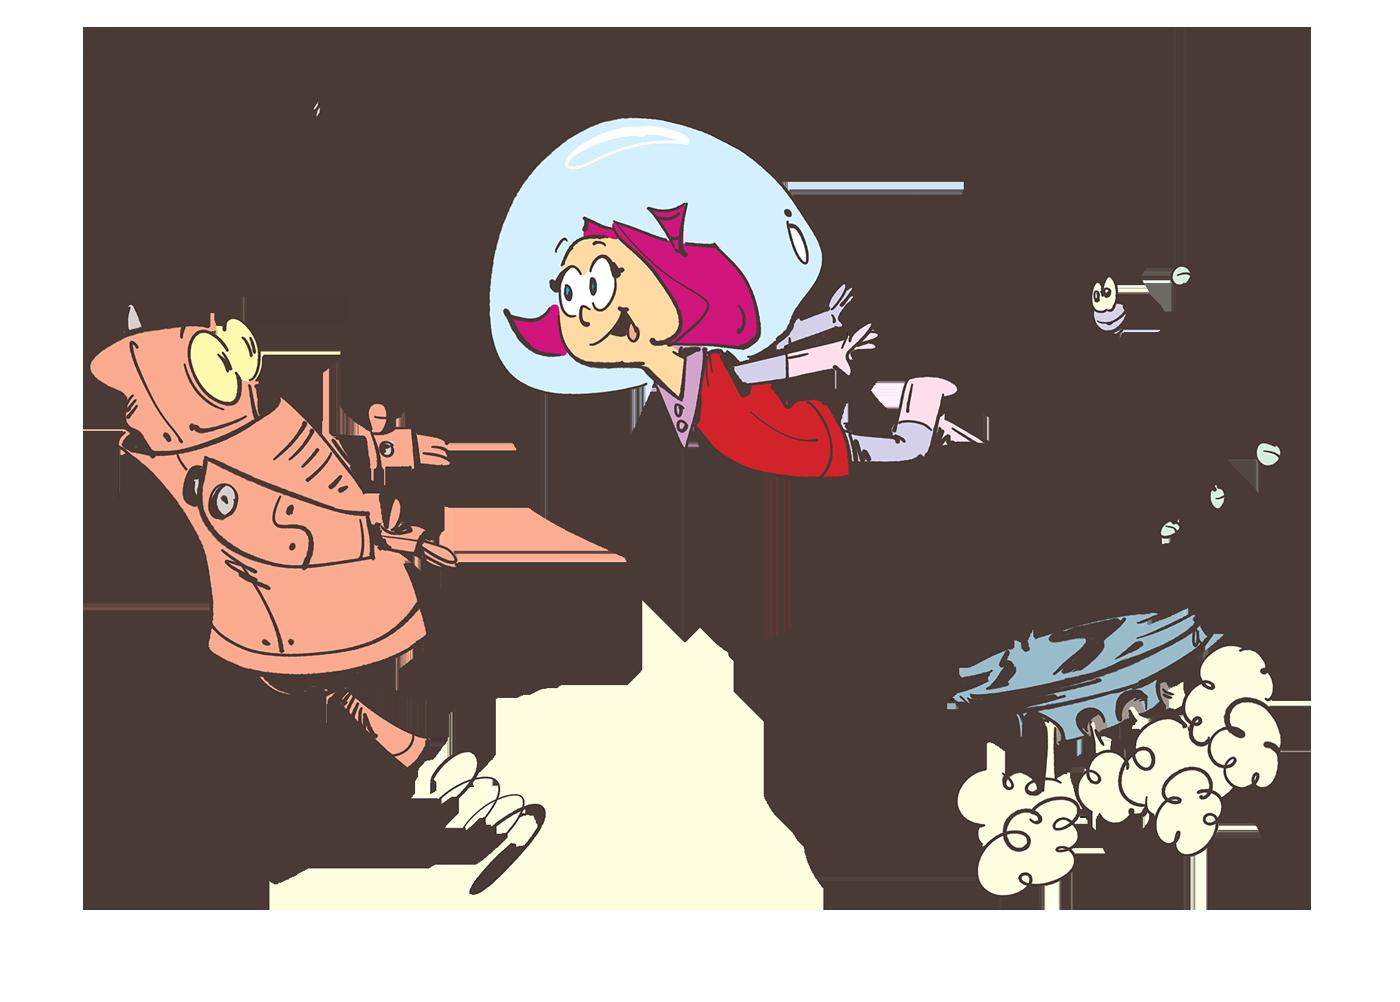 Dekkin jumping off a platform in the Arties hands - Spaceman Jax - Illustration by Cesare Asaro